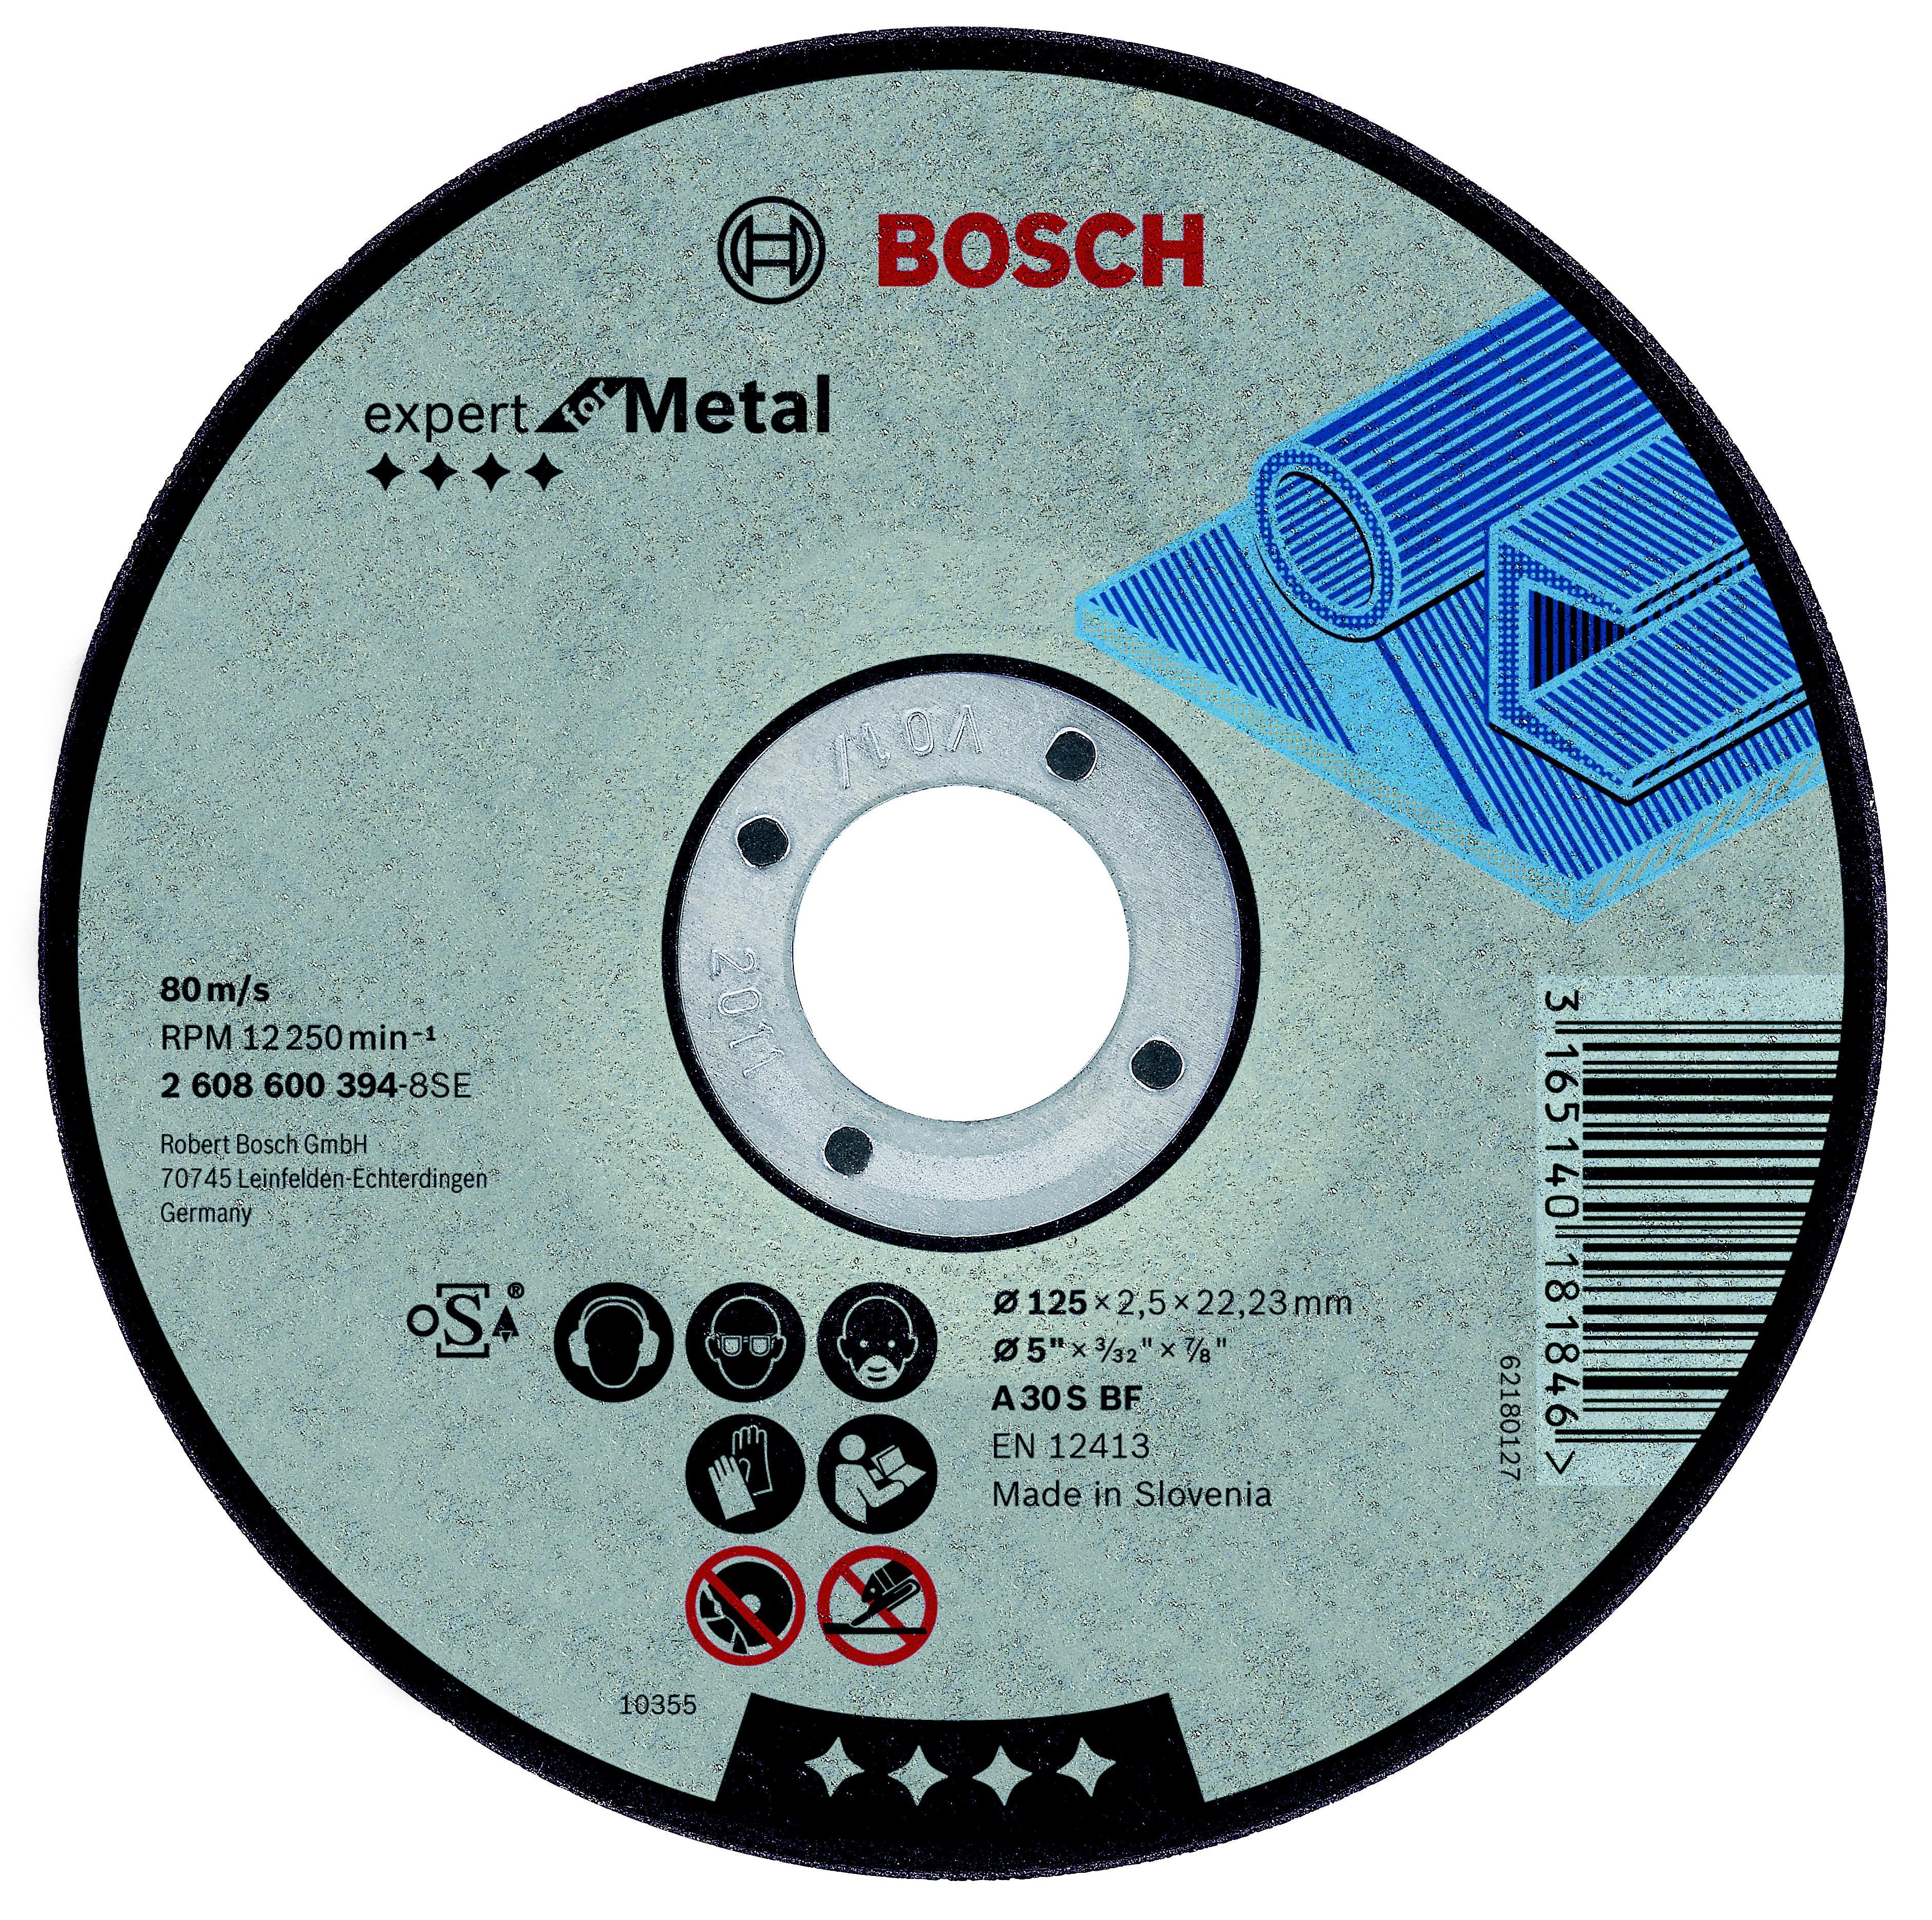 Круг отрезной Bosch 150х2.5х22 expert for metal (2.608.600.382) круг отрезной bosch expert for metal 230x1 9x22 2 608 603 400